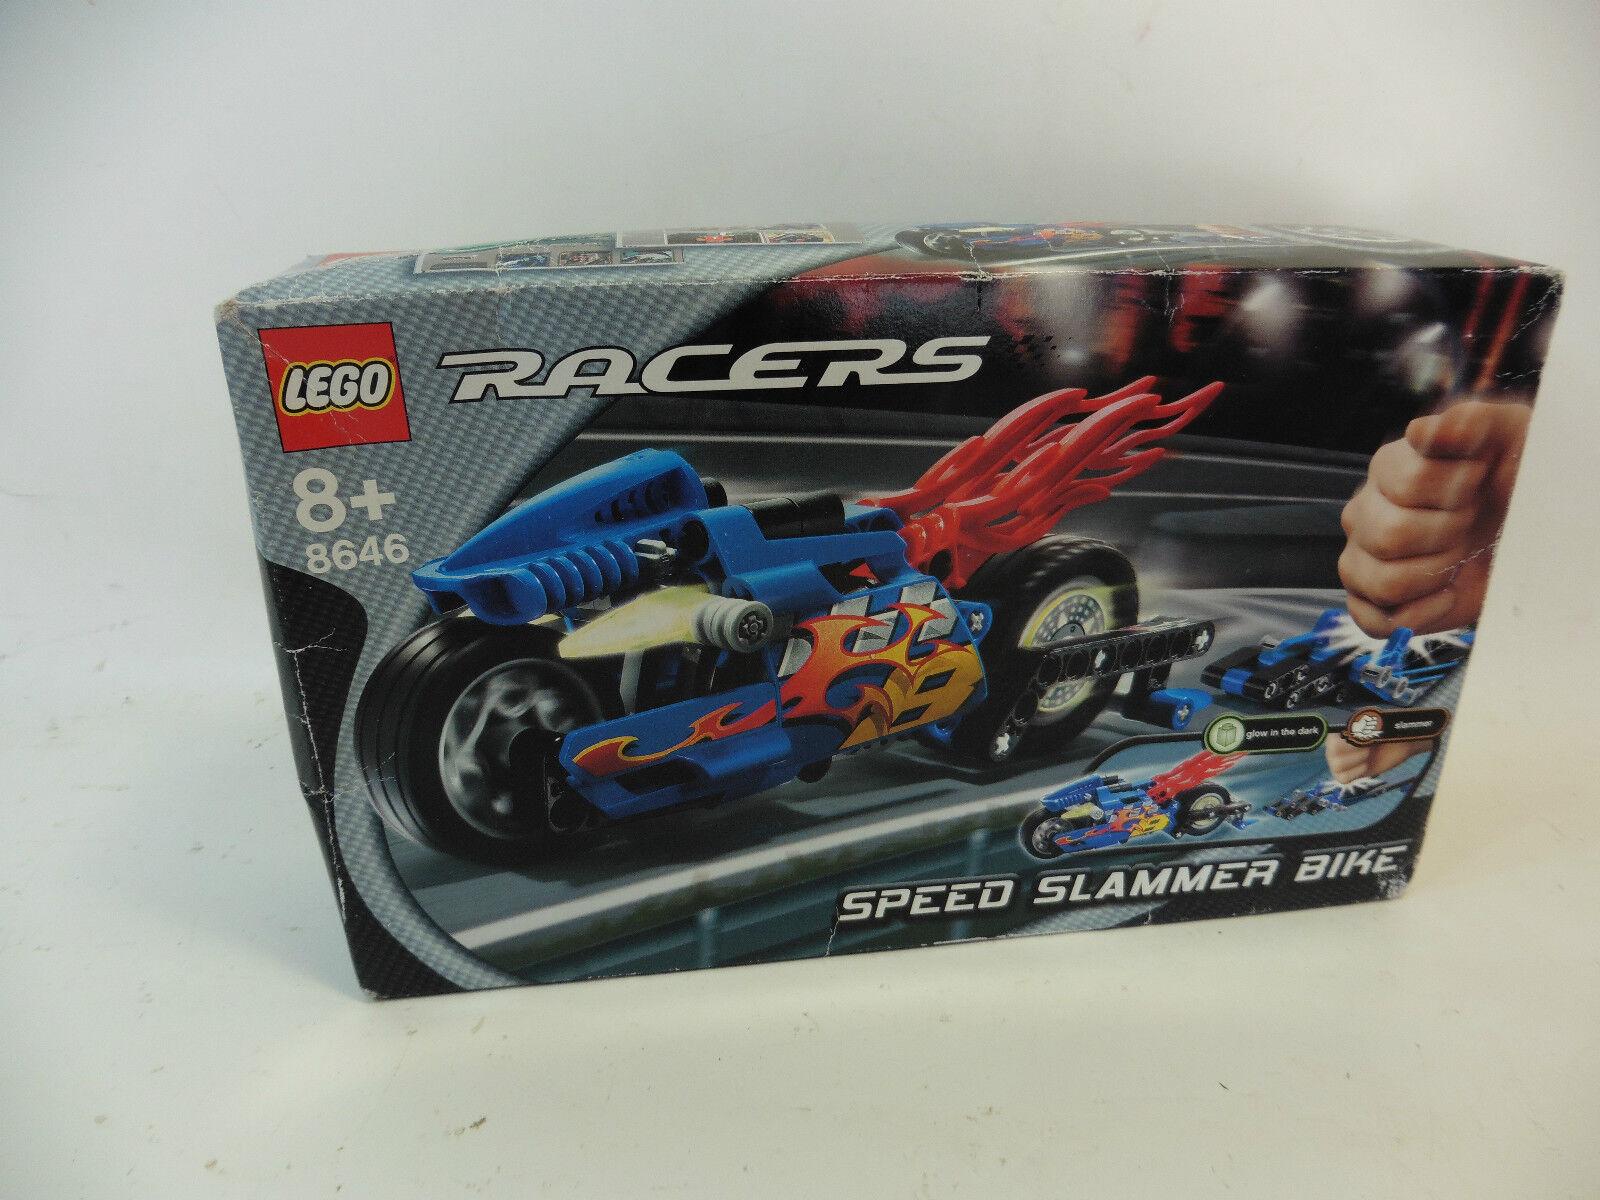 LEGO 8646 SPEED SLAMMER BIKE IN BOX